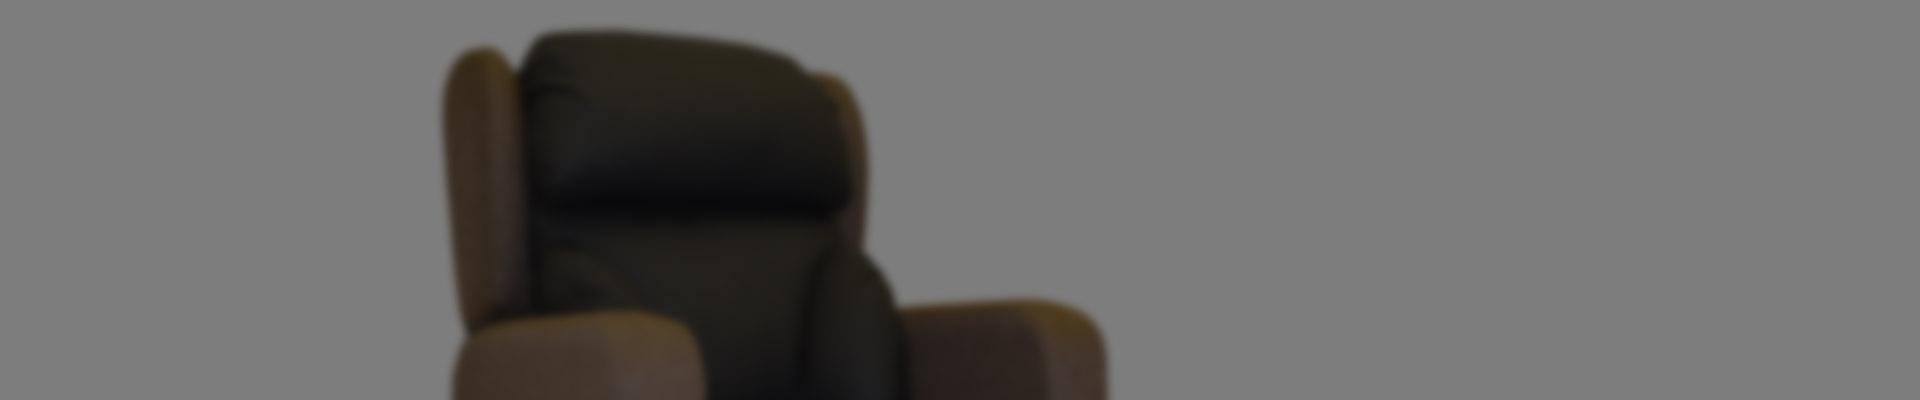 homecare-ecoflex-featured-image-blurred